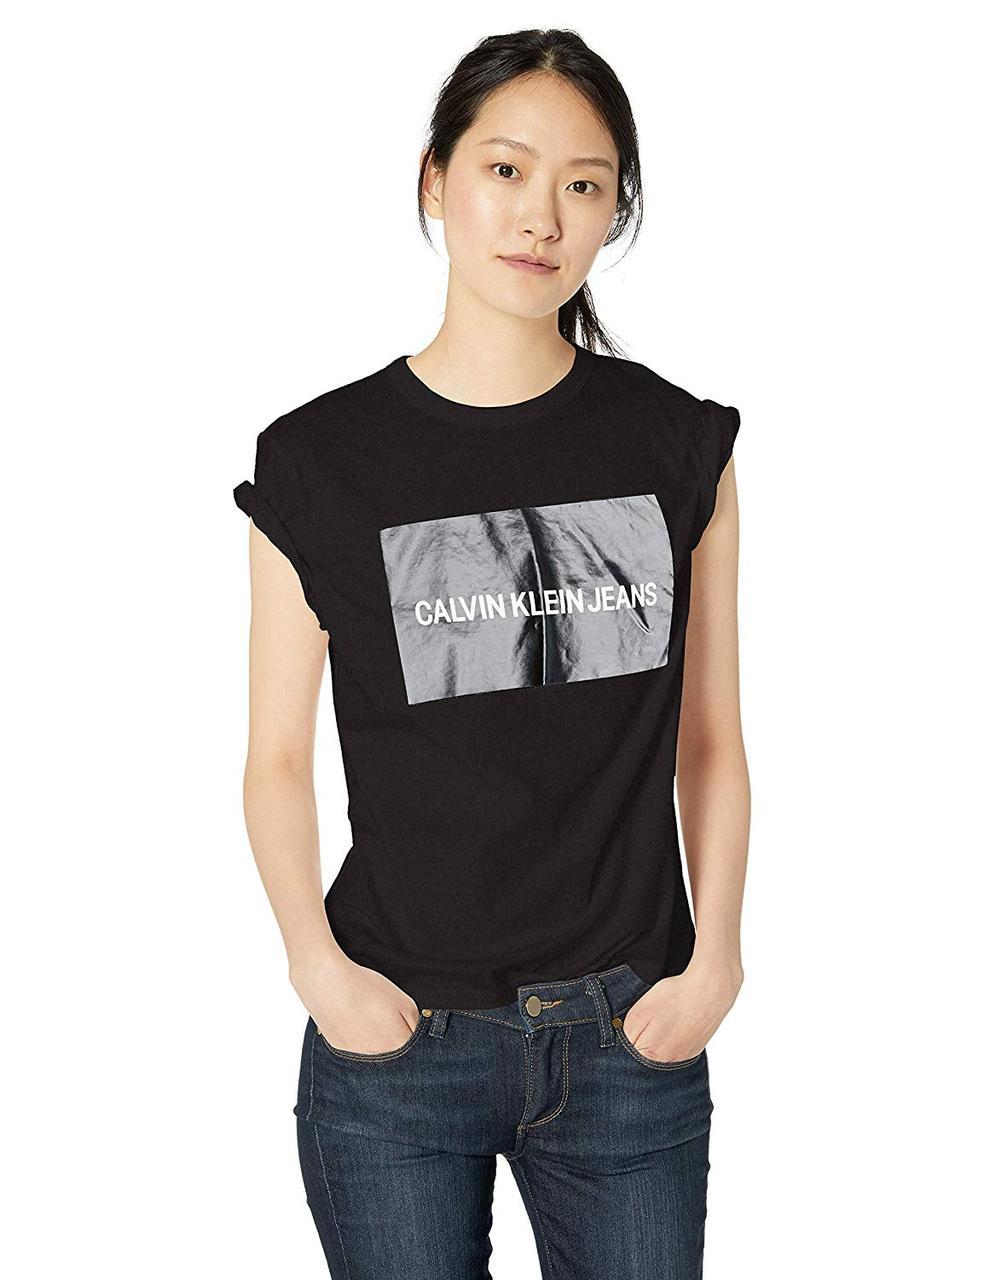 0136d93c603d9 Женская Футболка Calvin Klein Jeans Размер L ОРИГИНАЛ — в Категории ...